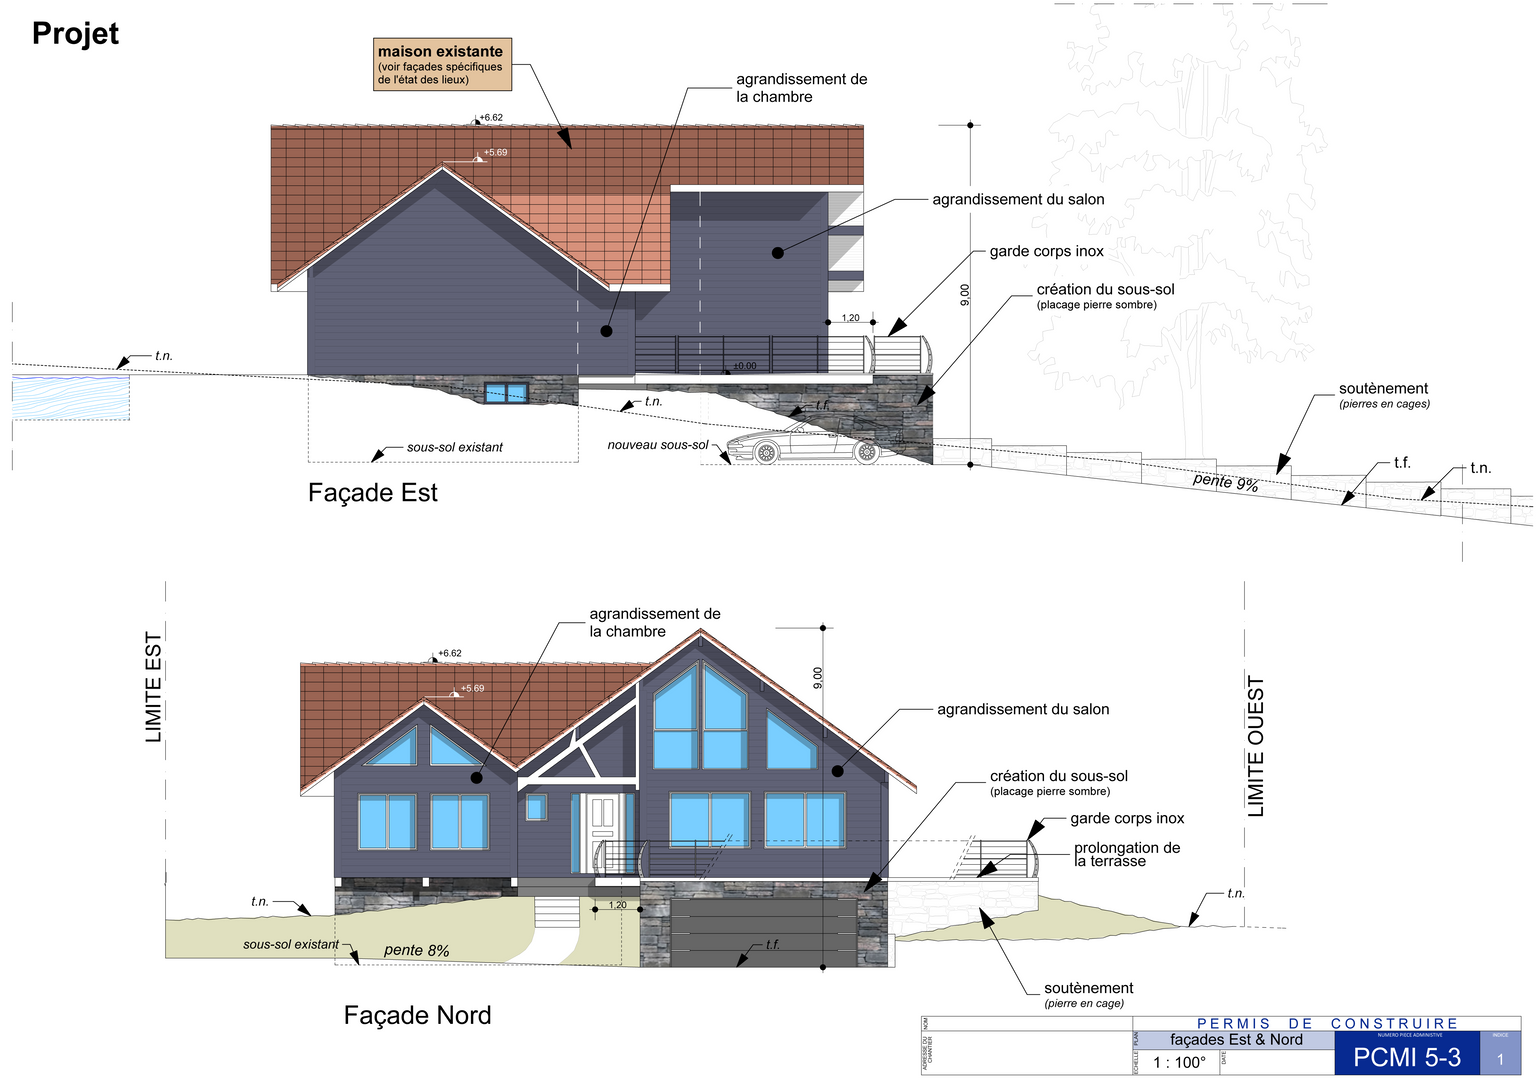 façades de la construction modifiée